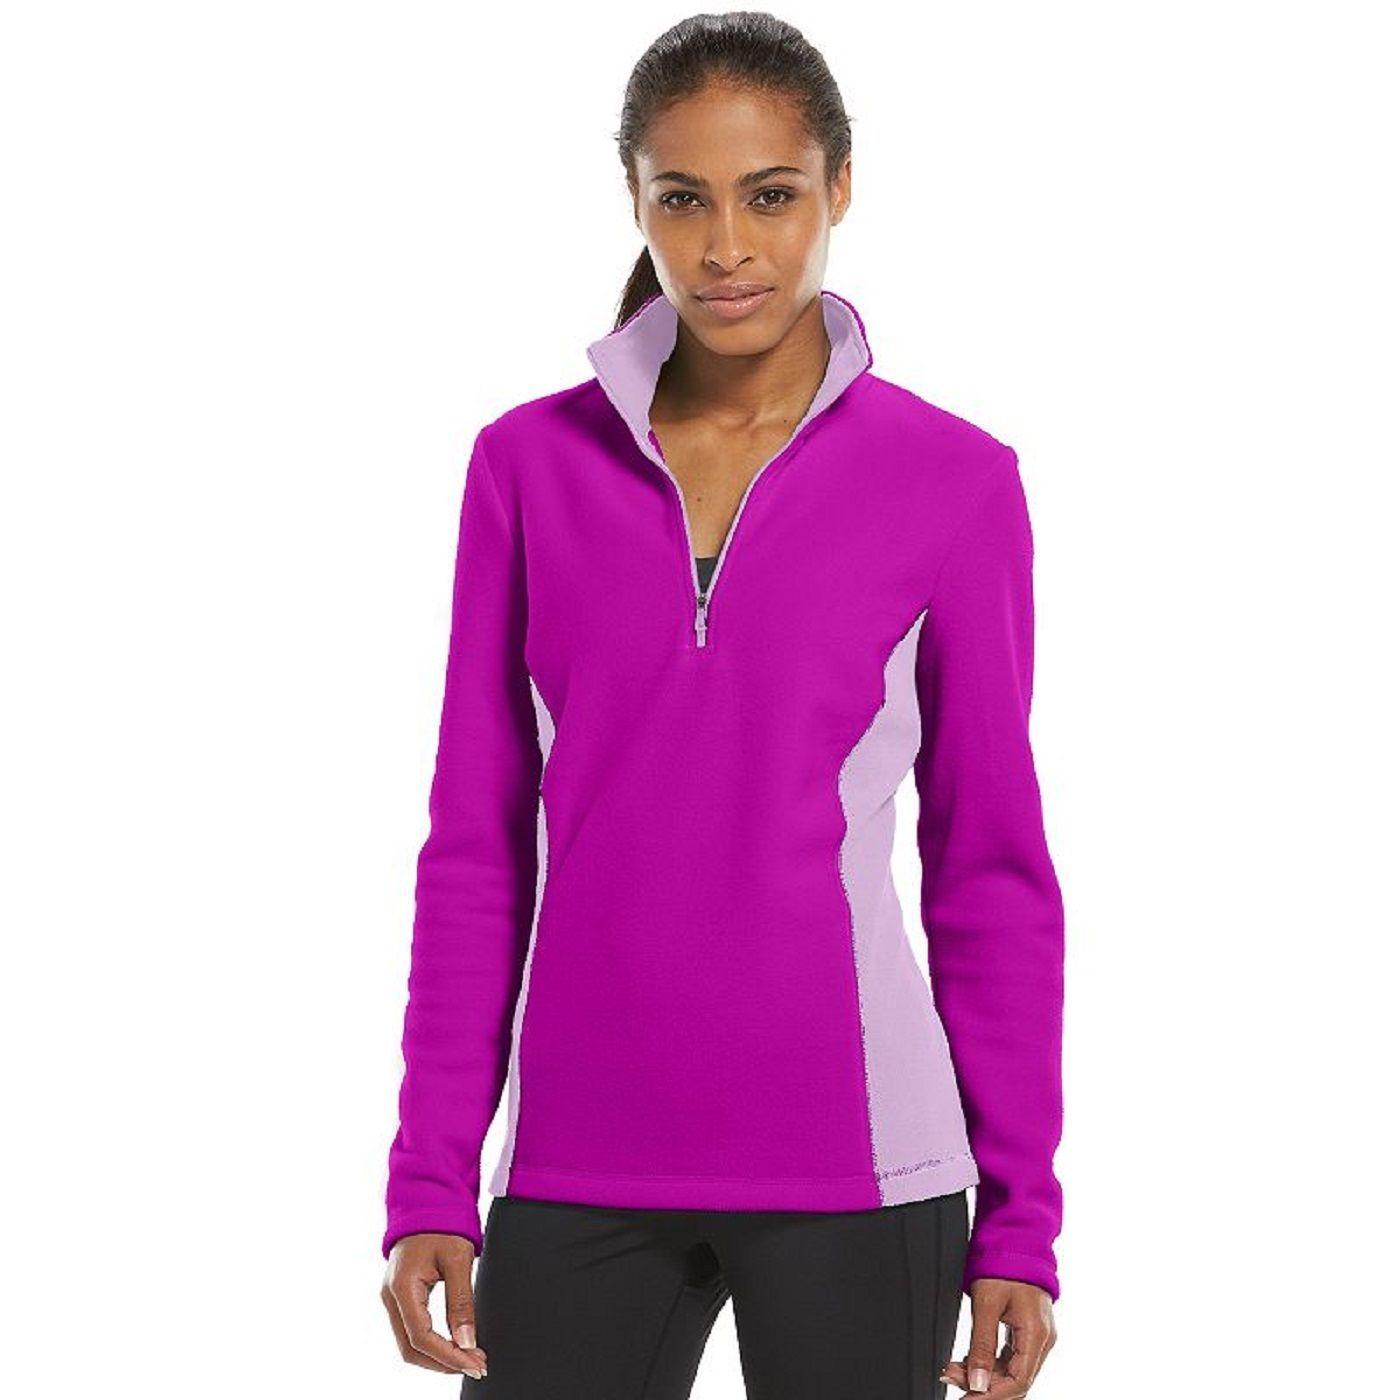 195ac6a04a0f Tek Gear Berry Lavender Quarter Zip MicroFleece Jacket Size XS Fashion New  Nwt -  12.82